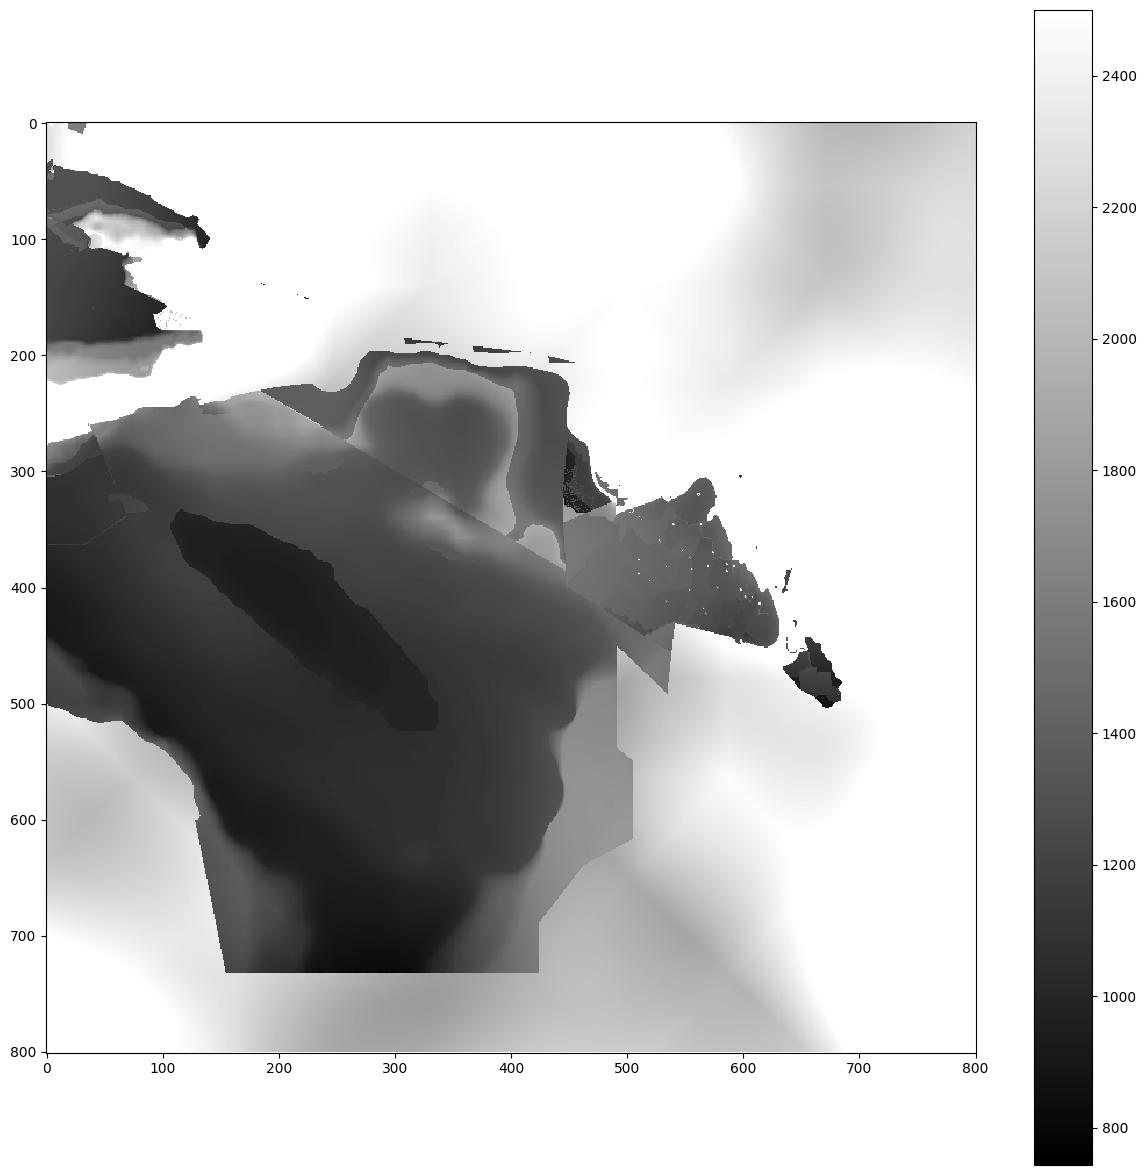 bench/seismic/wp/la_habra/meshes/velocity_model/plots/vs_750.png